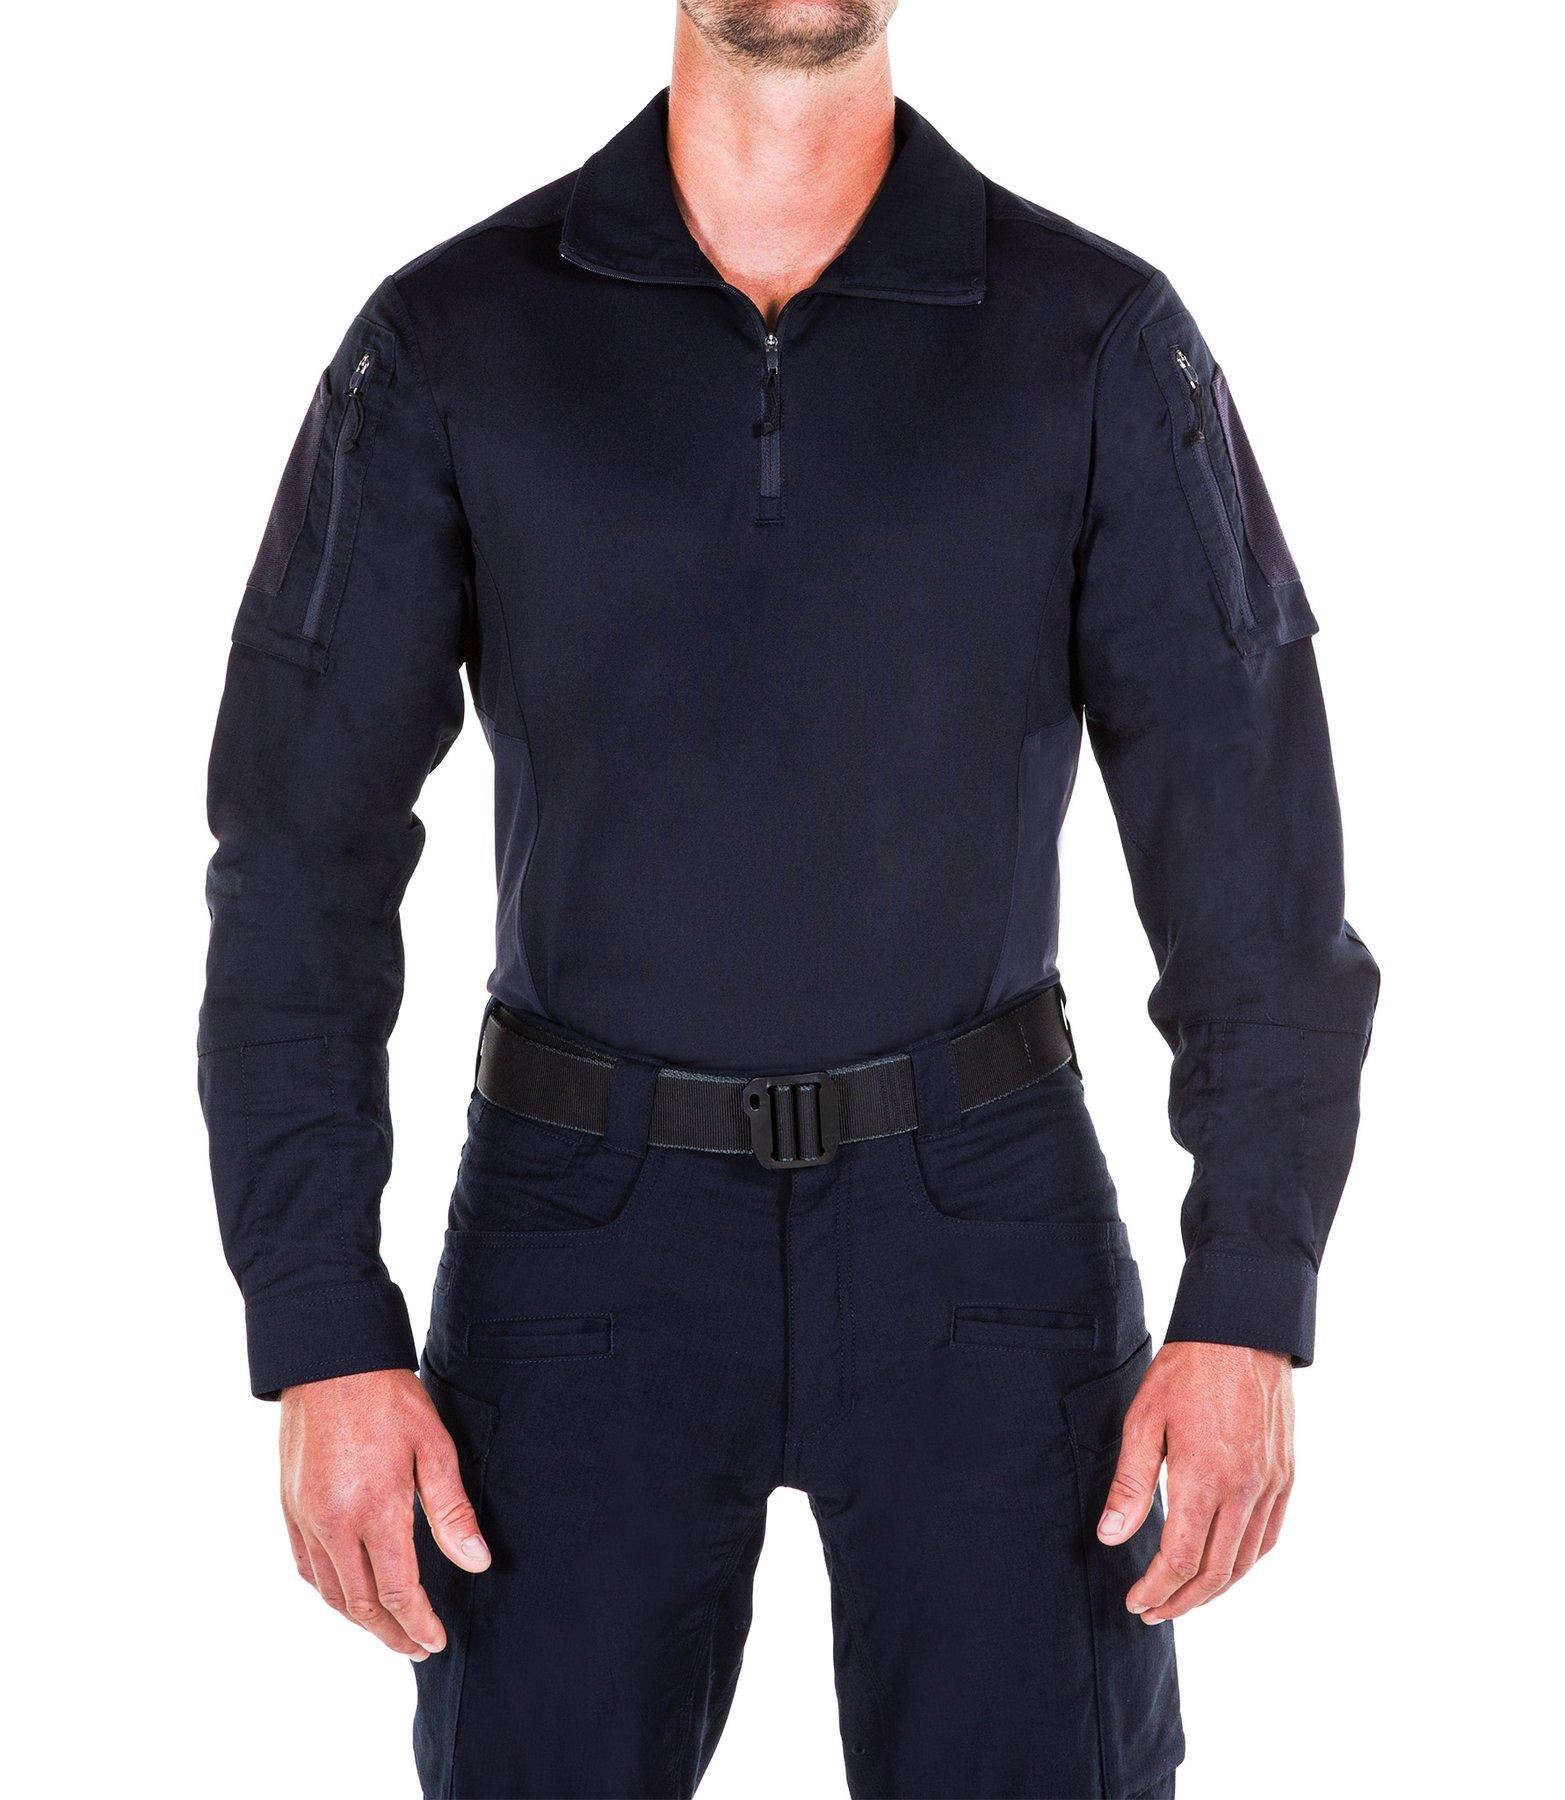 MEN'S DEFENDER SHIRT-First Tactical